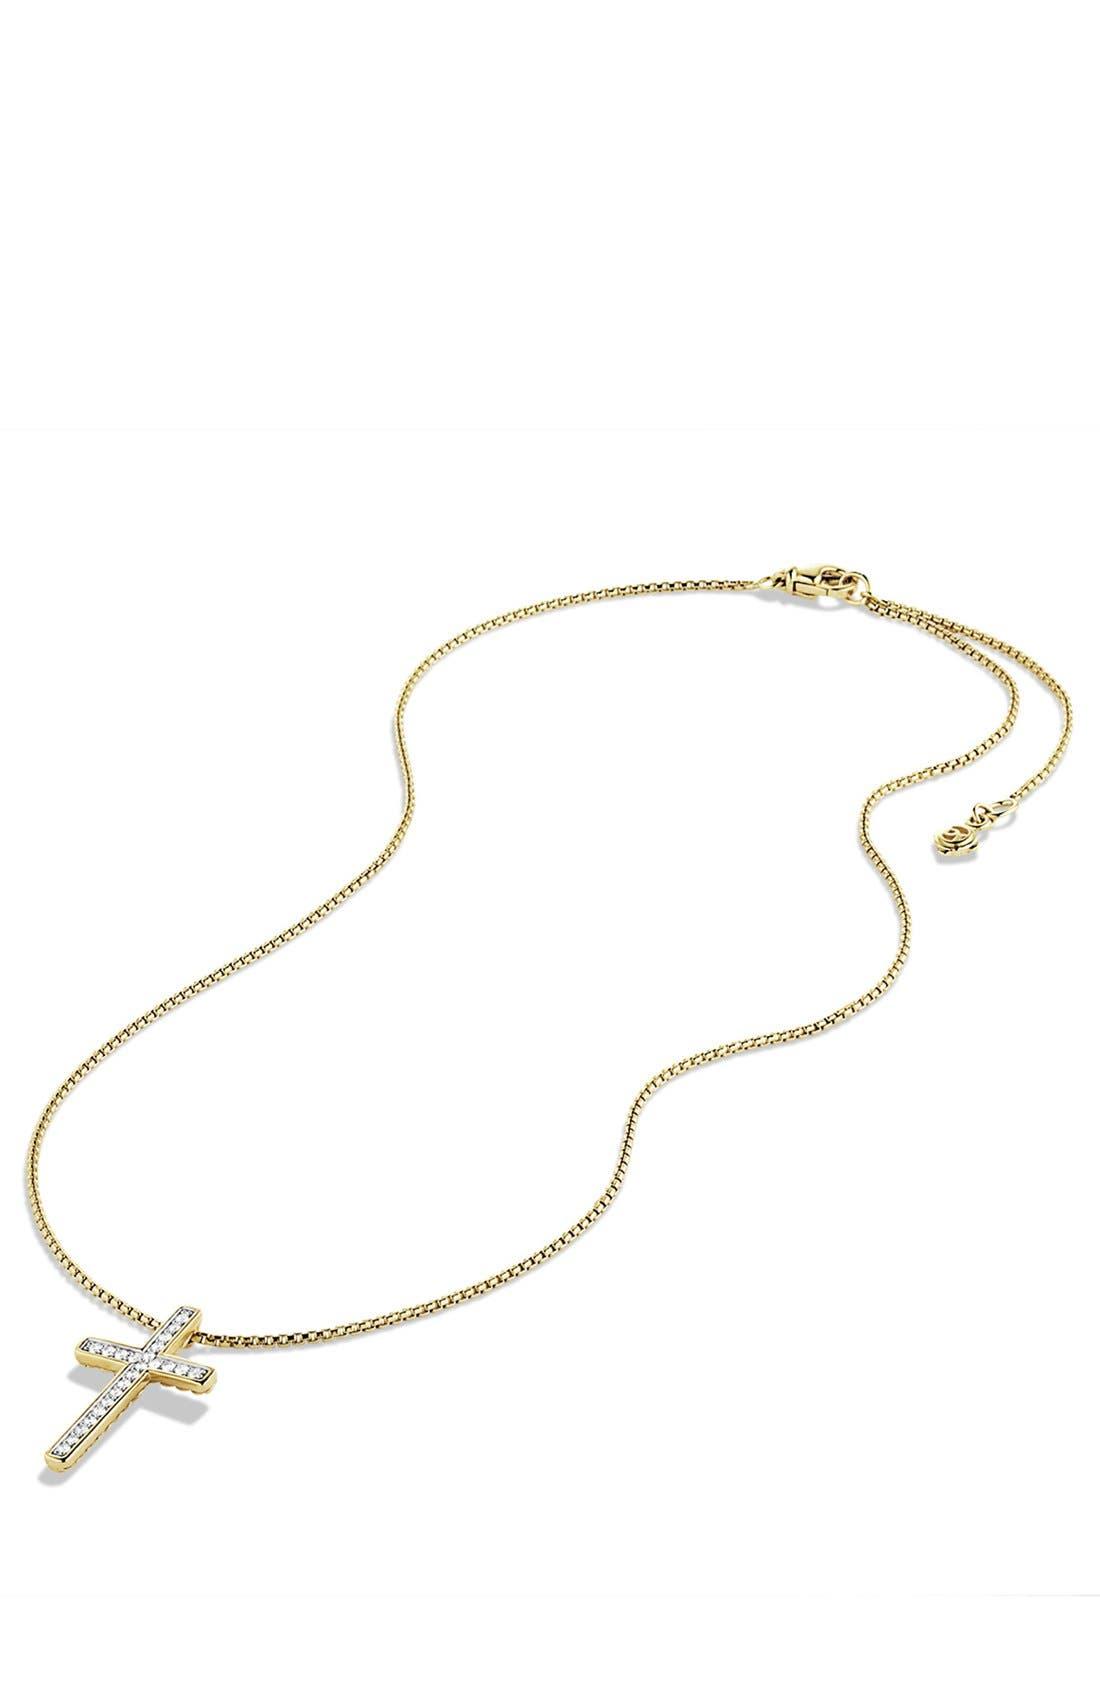 Alternate Image 3  - David Yurman 'X' Petite Pavé Cross Necklace with Diamonds in Gold